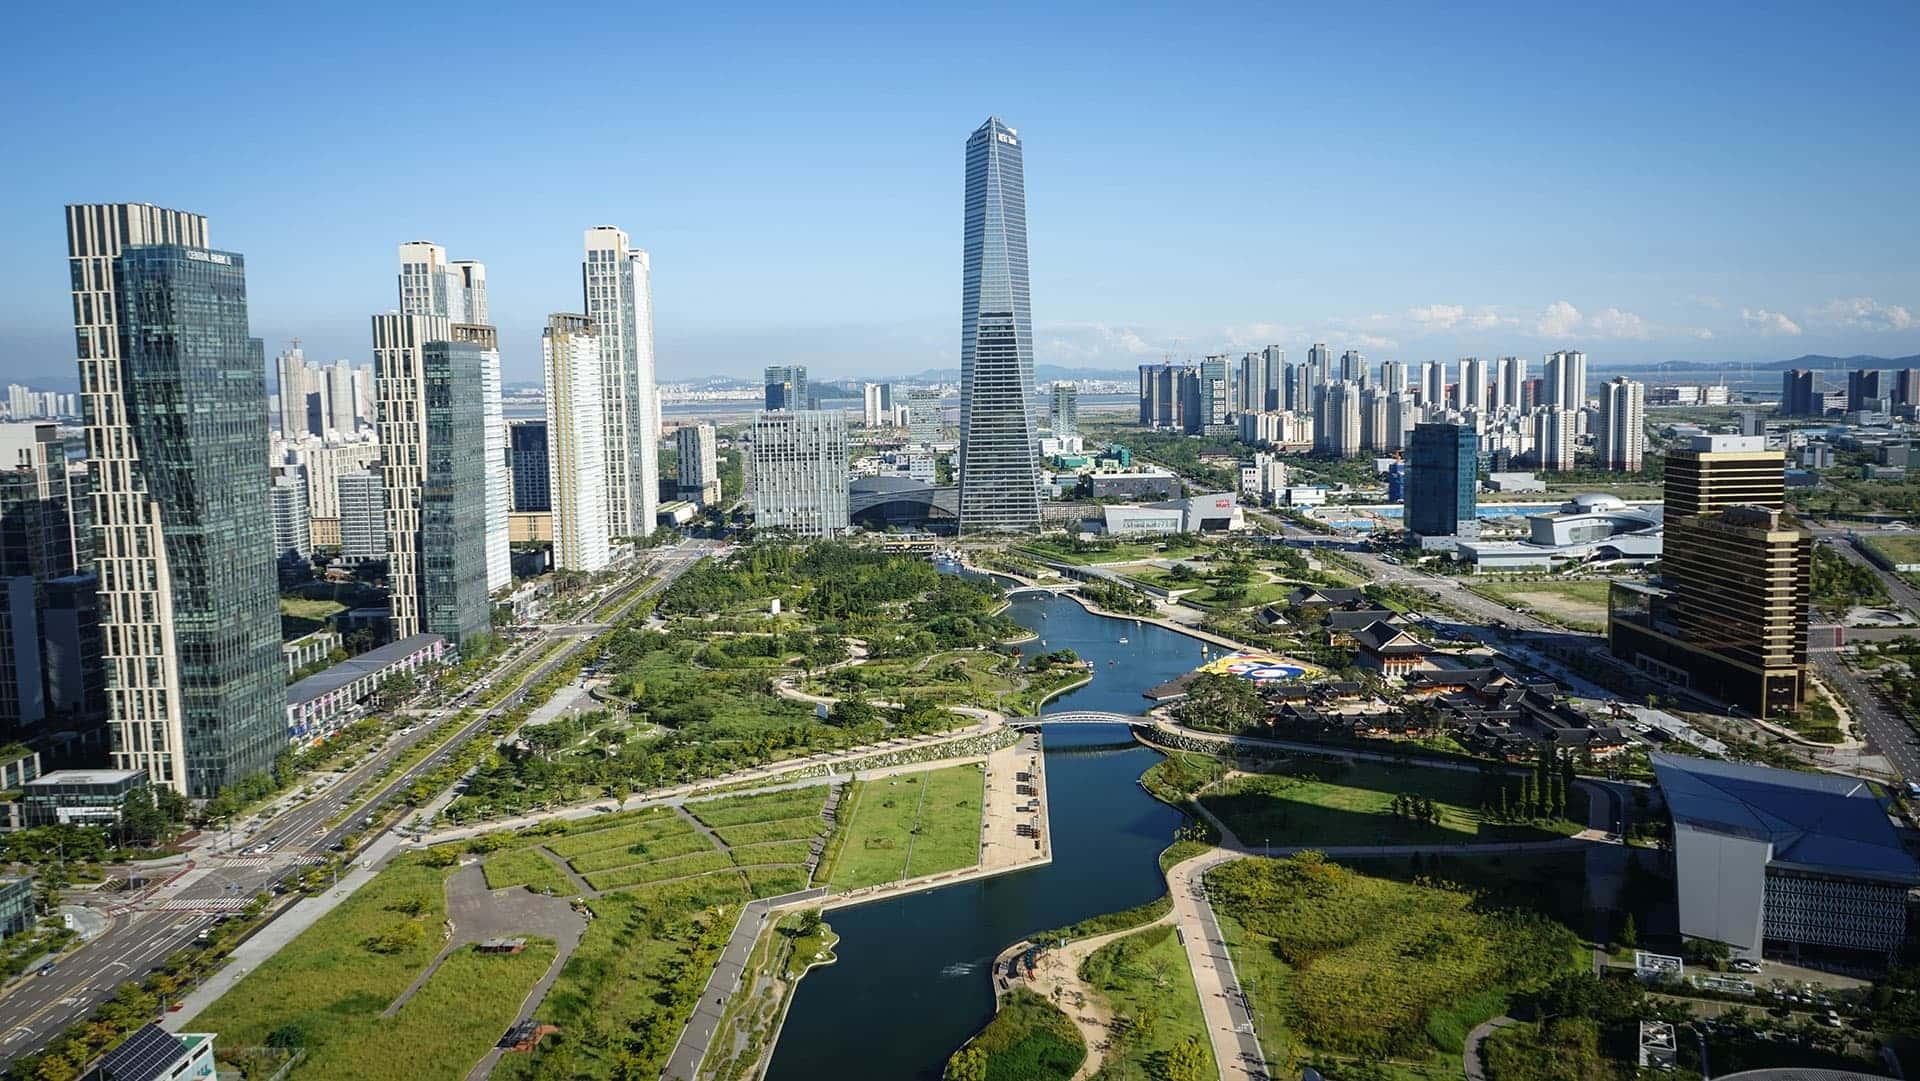 Smart City Songdo